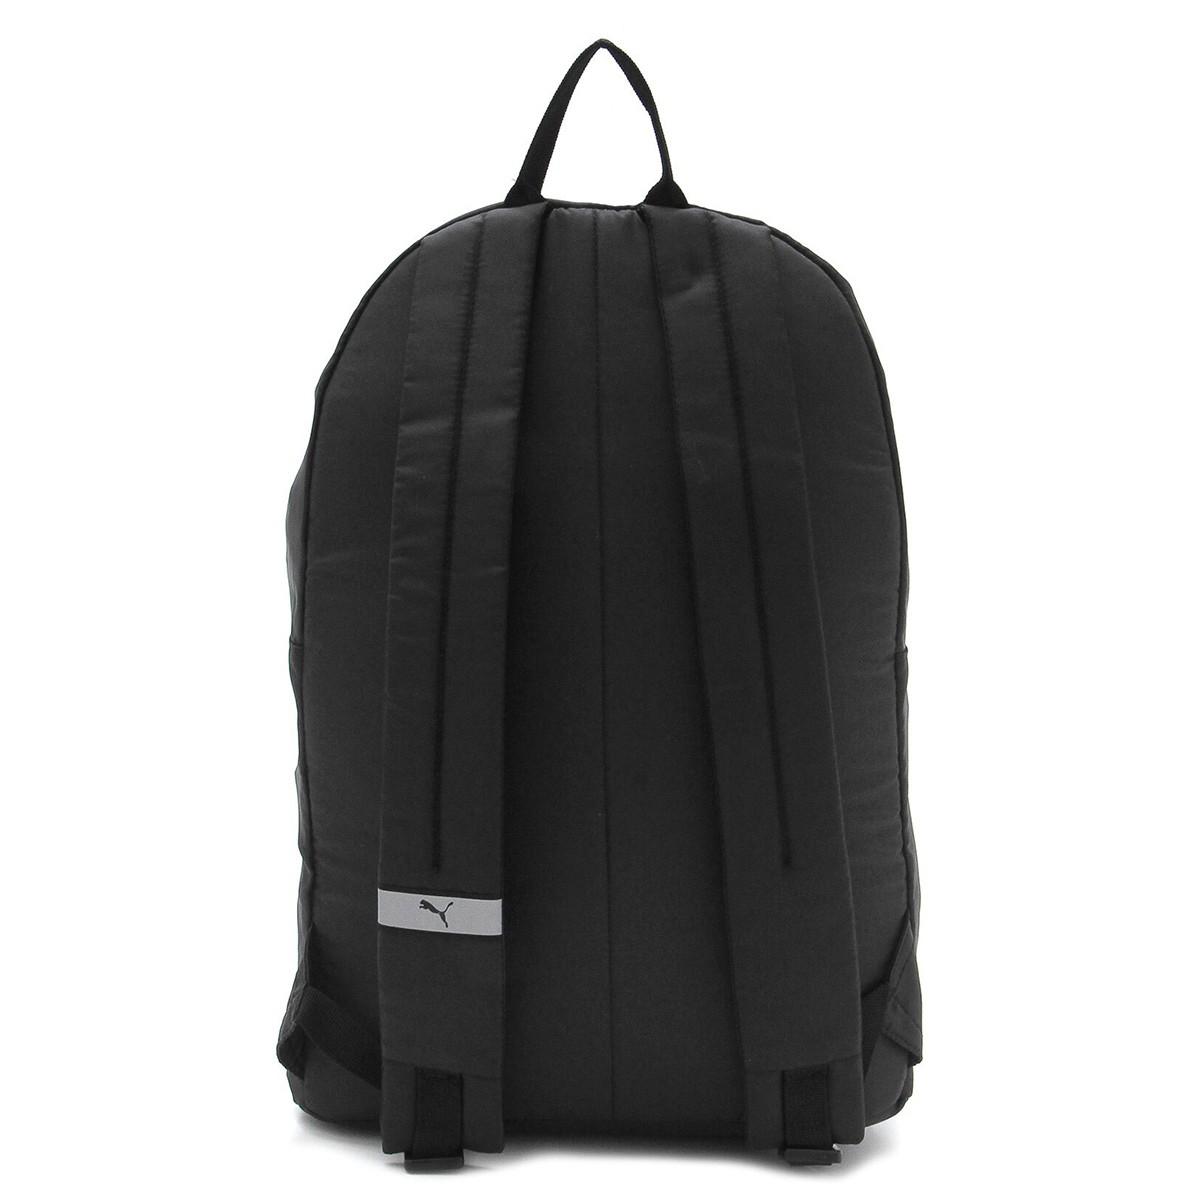 Mochila Puma Classic Backpack Preta